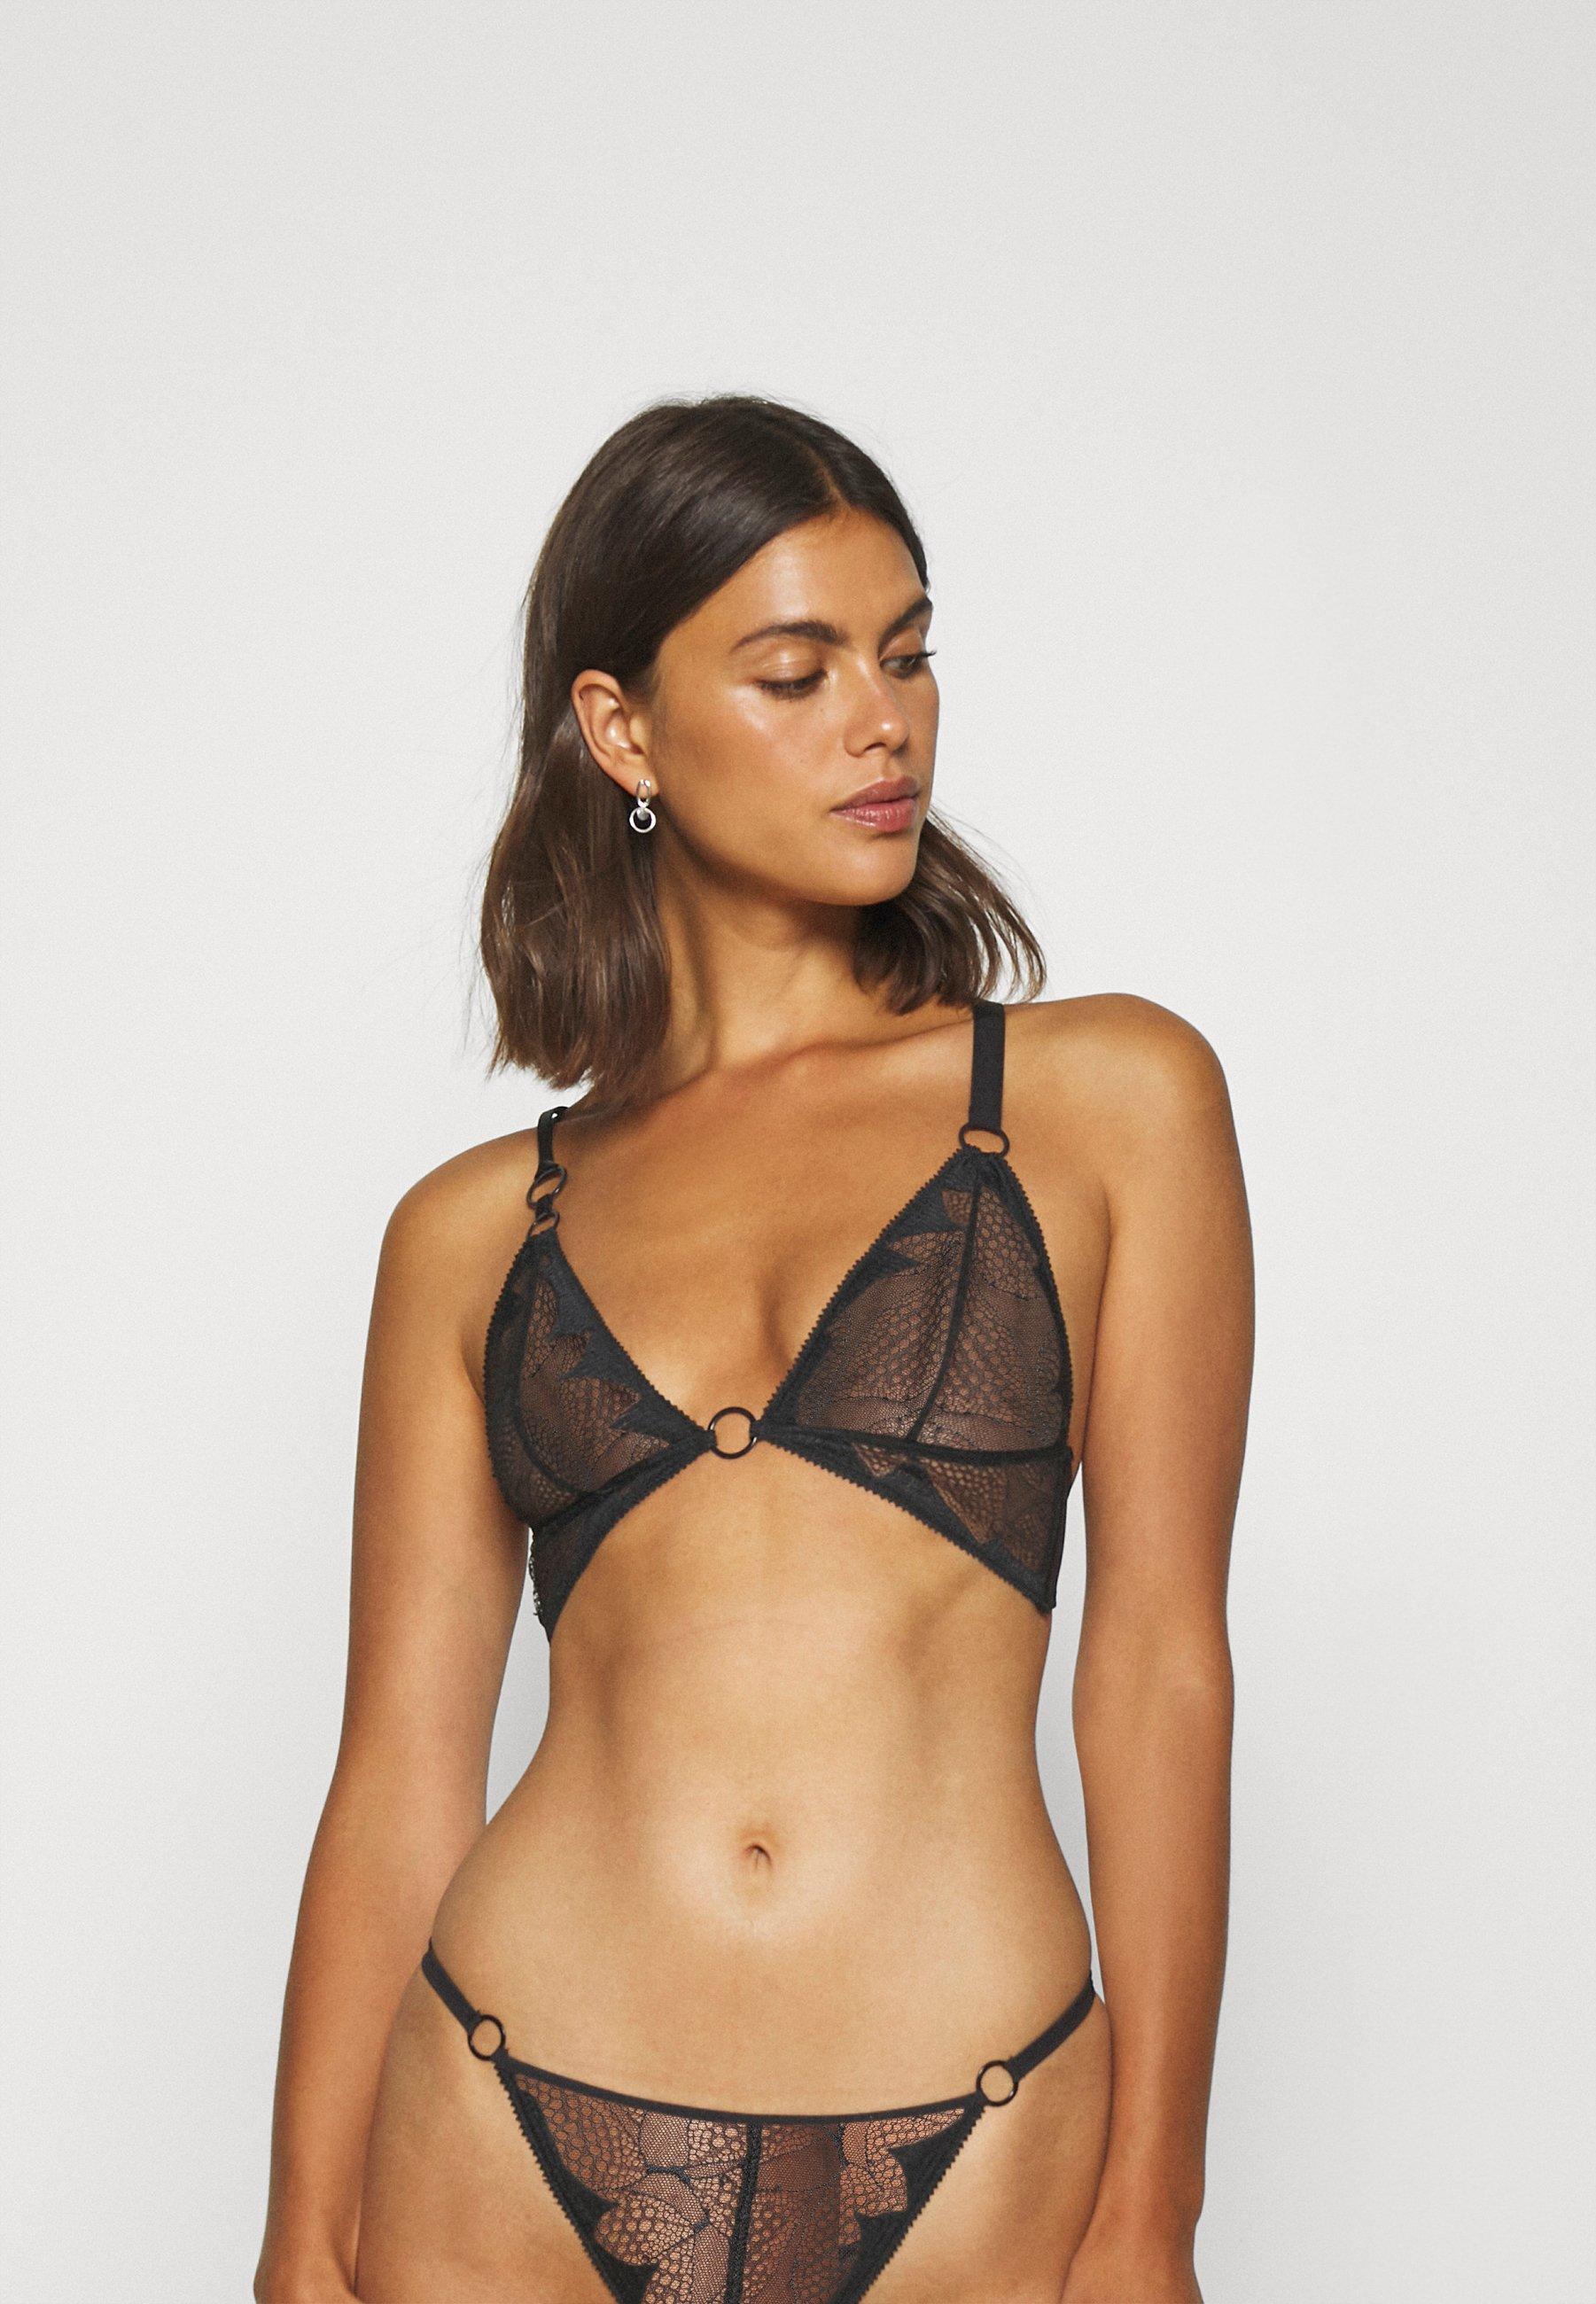 Femme TOUCH - Soutien-gorge triangle